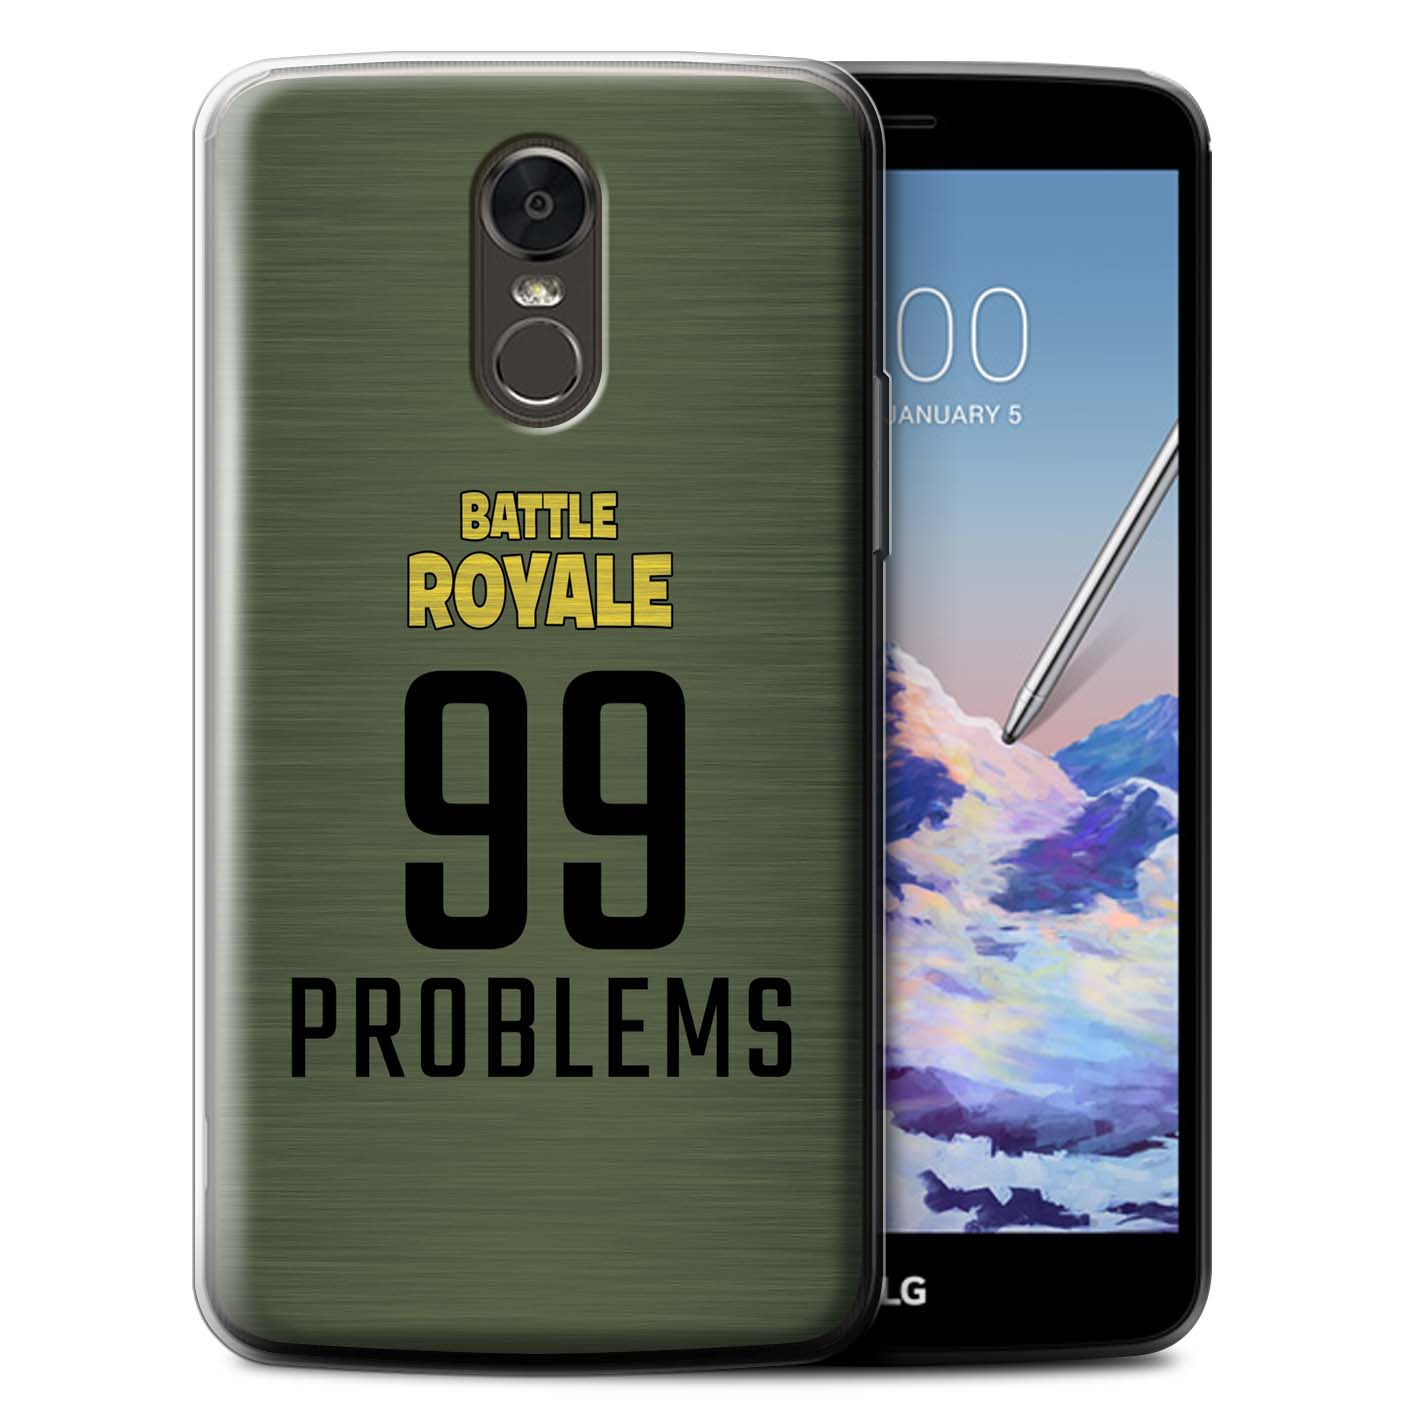 STUFF4-Gel-TPU-Phone-Case-for-LG-Stylus-3-Stylo-3-K10-Pro-FN-Battle-Royale